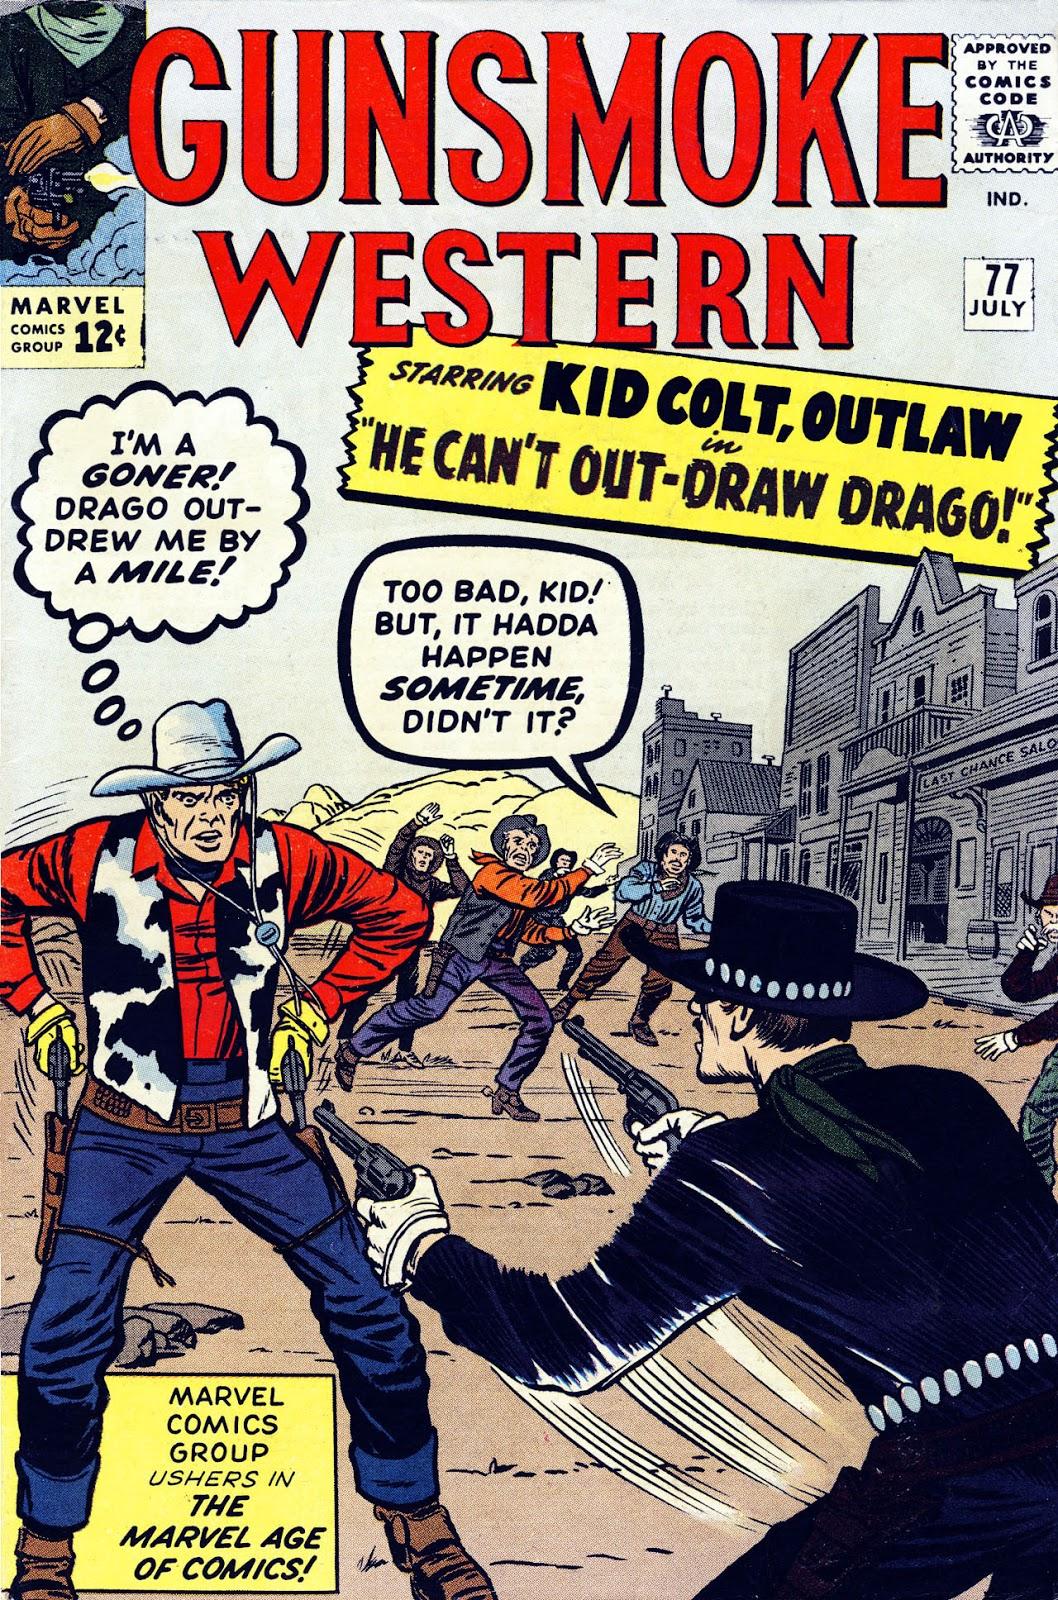 Gunsmoke Western issue 77 - Page 1